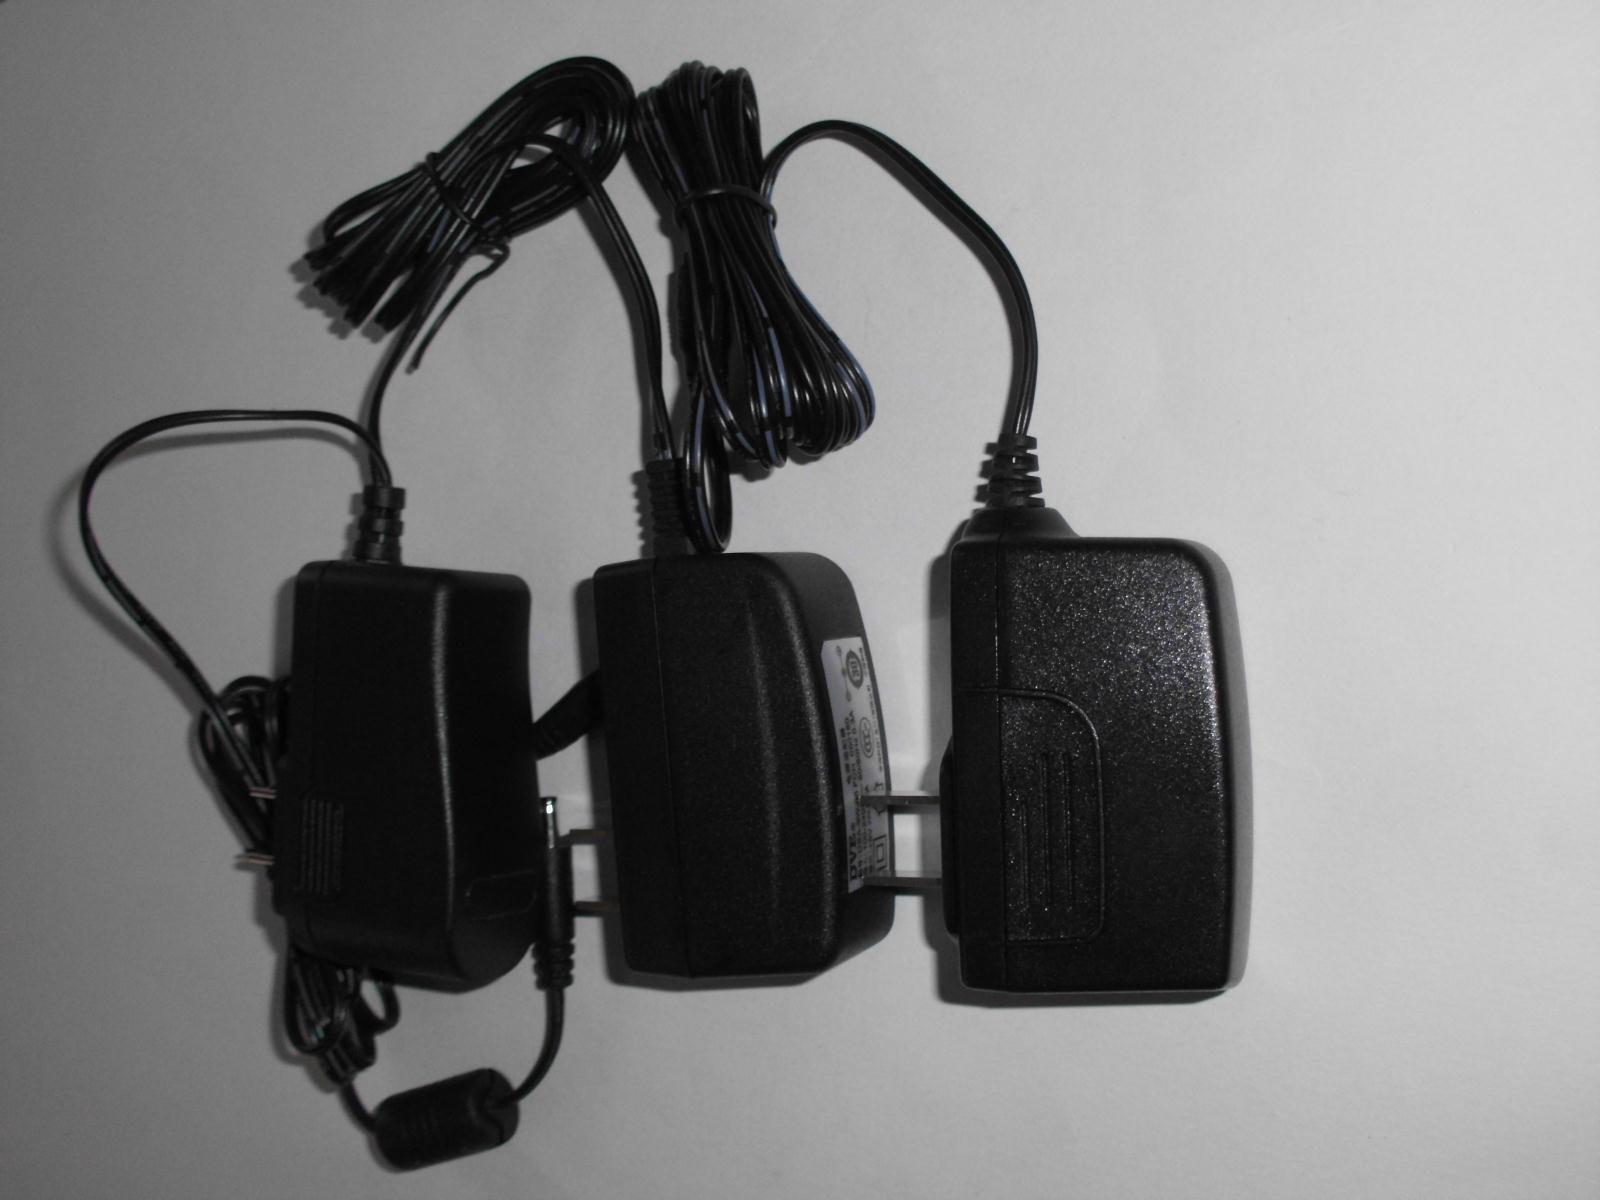 爱国者数码相机F100F200F210T1028T30T60T1260V780V890原装充电器